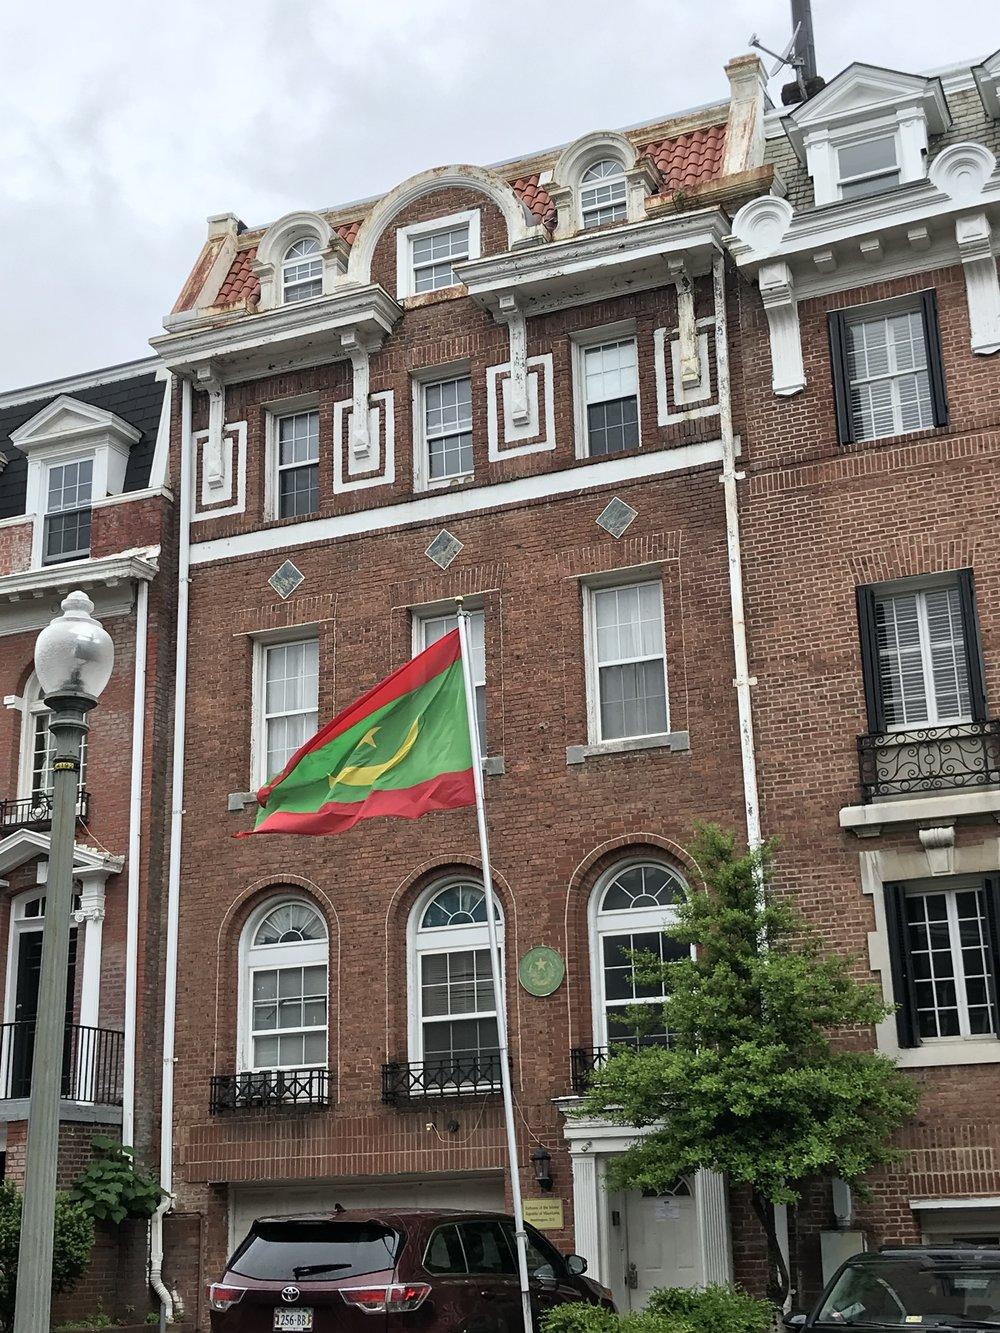 The Embassy of Mauritania.